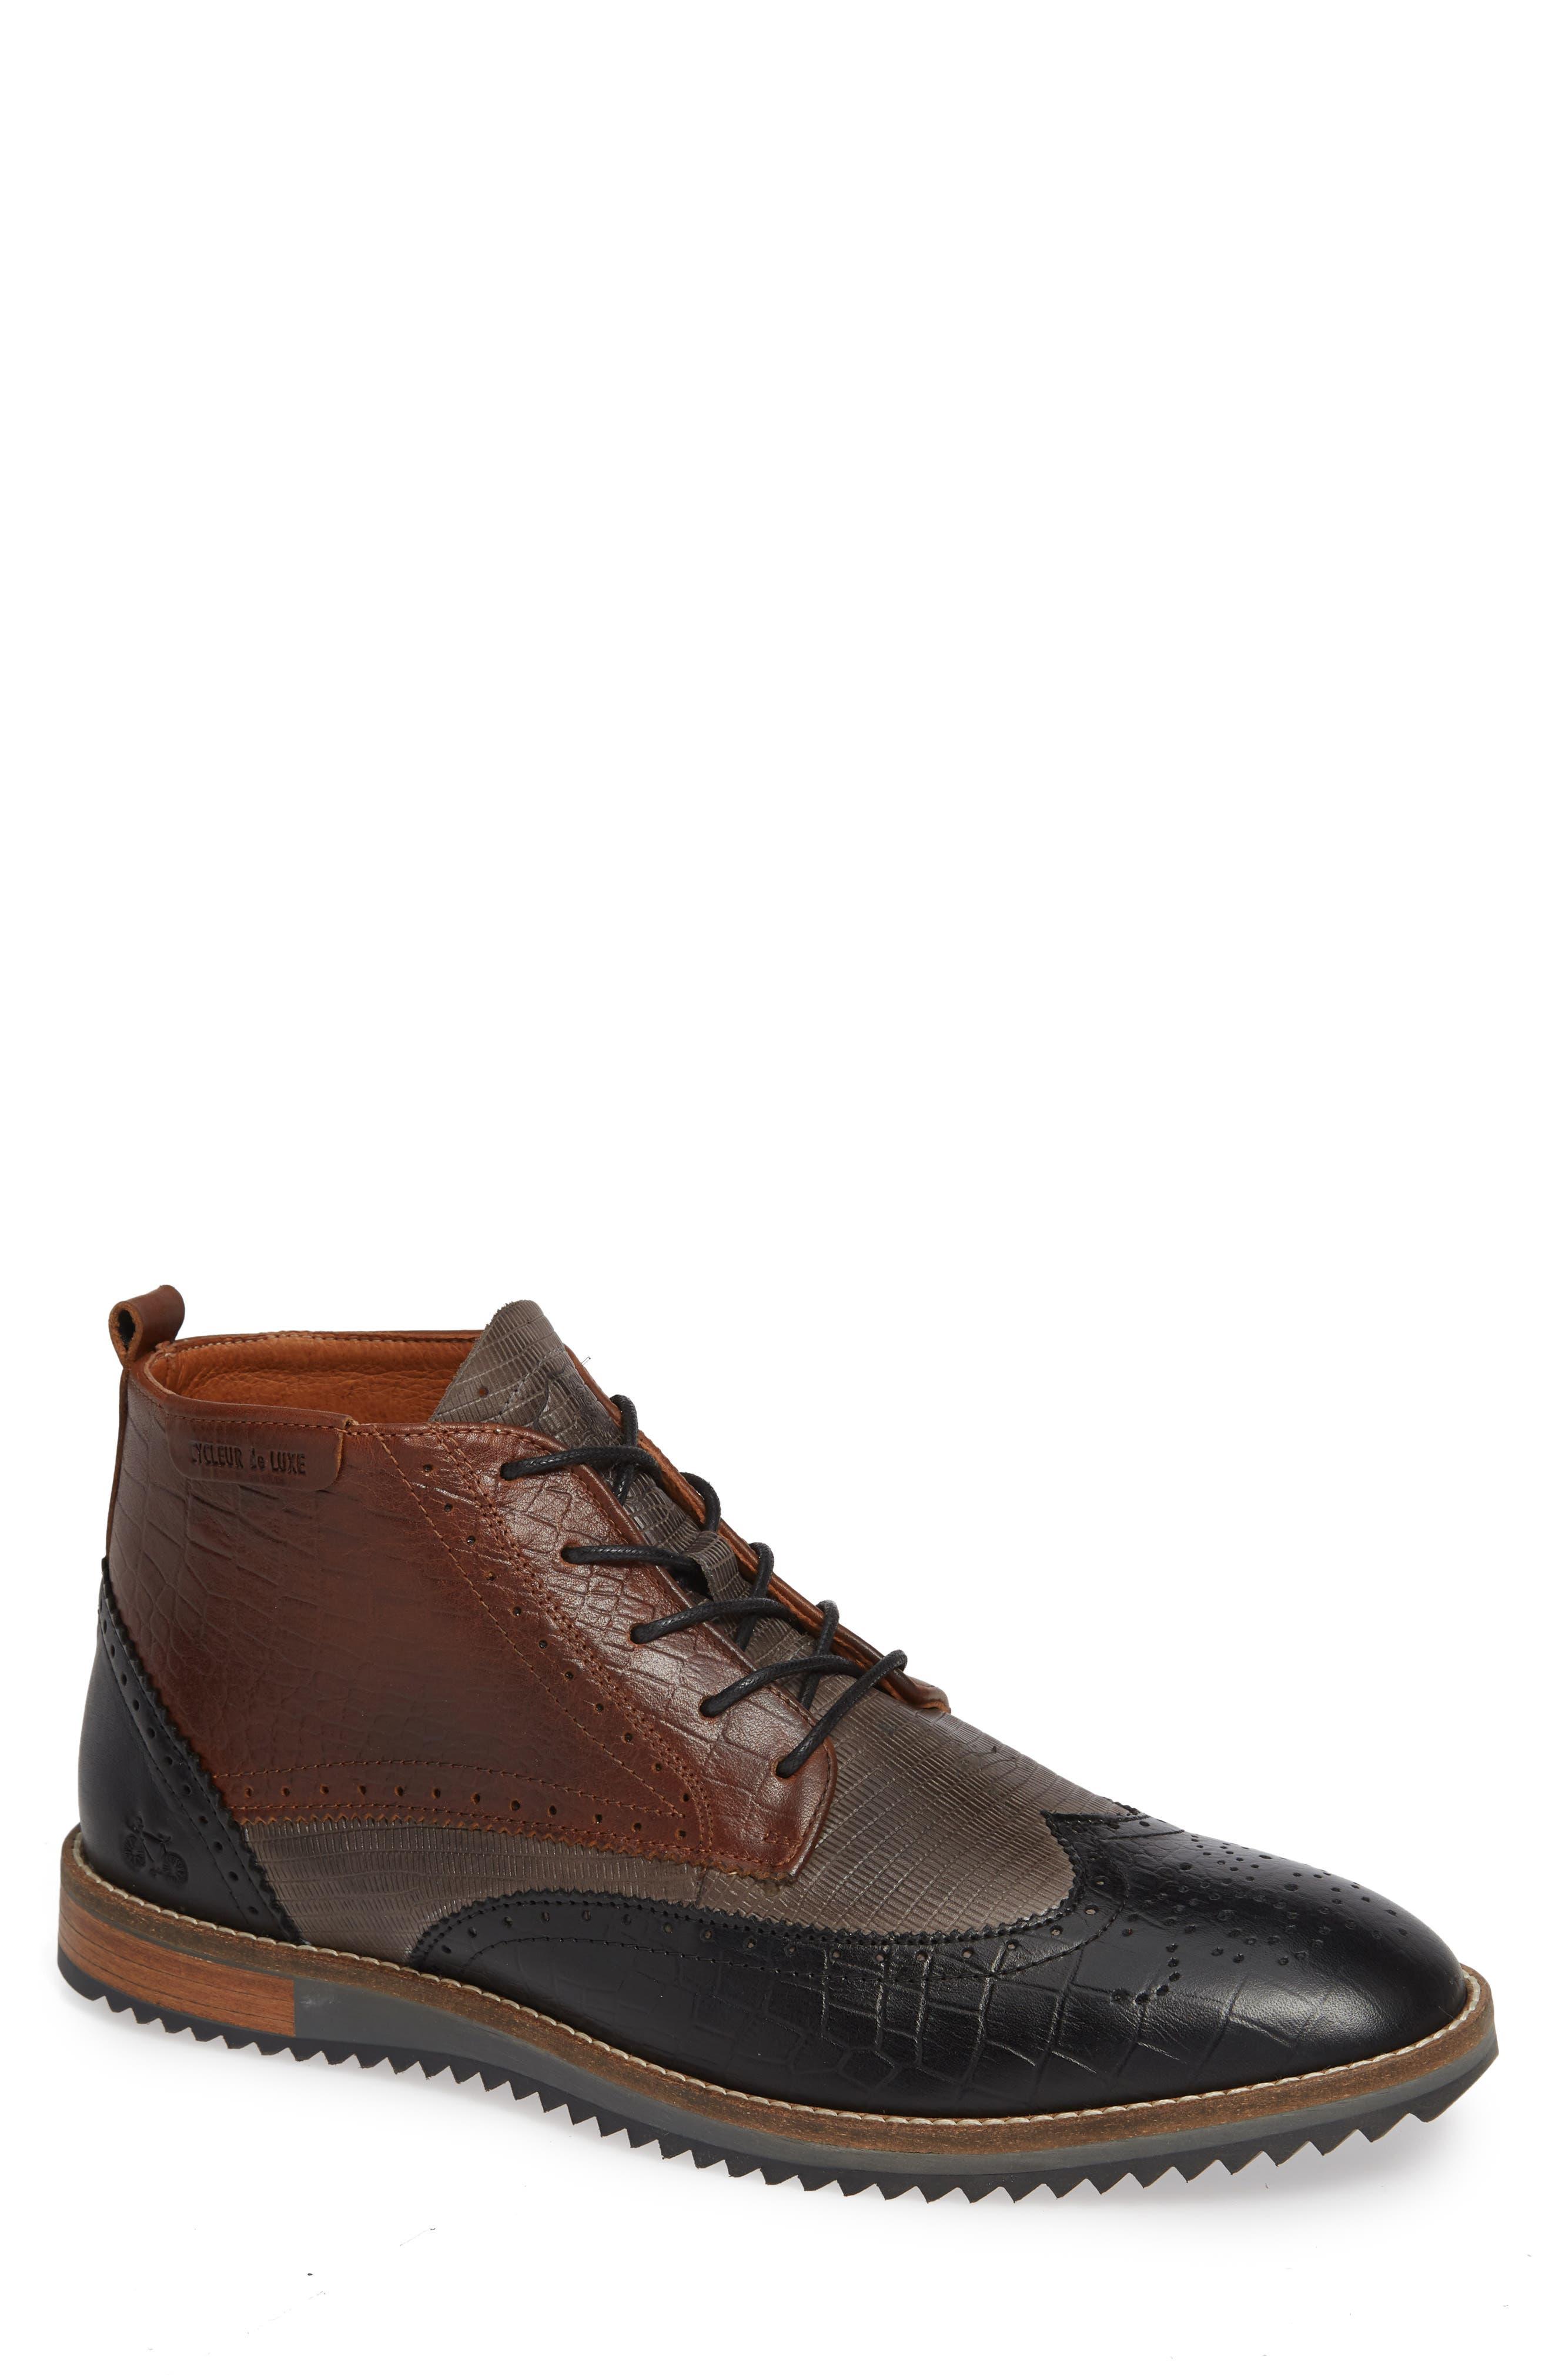 Lima Wingtip Boot,                         Main,                         color, BLACK/ GREY